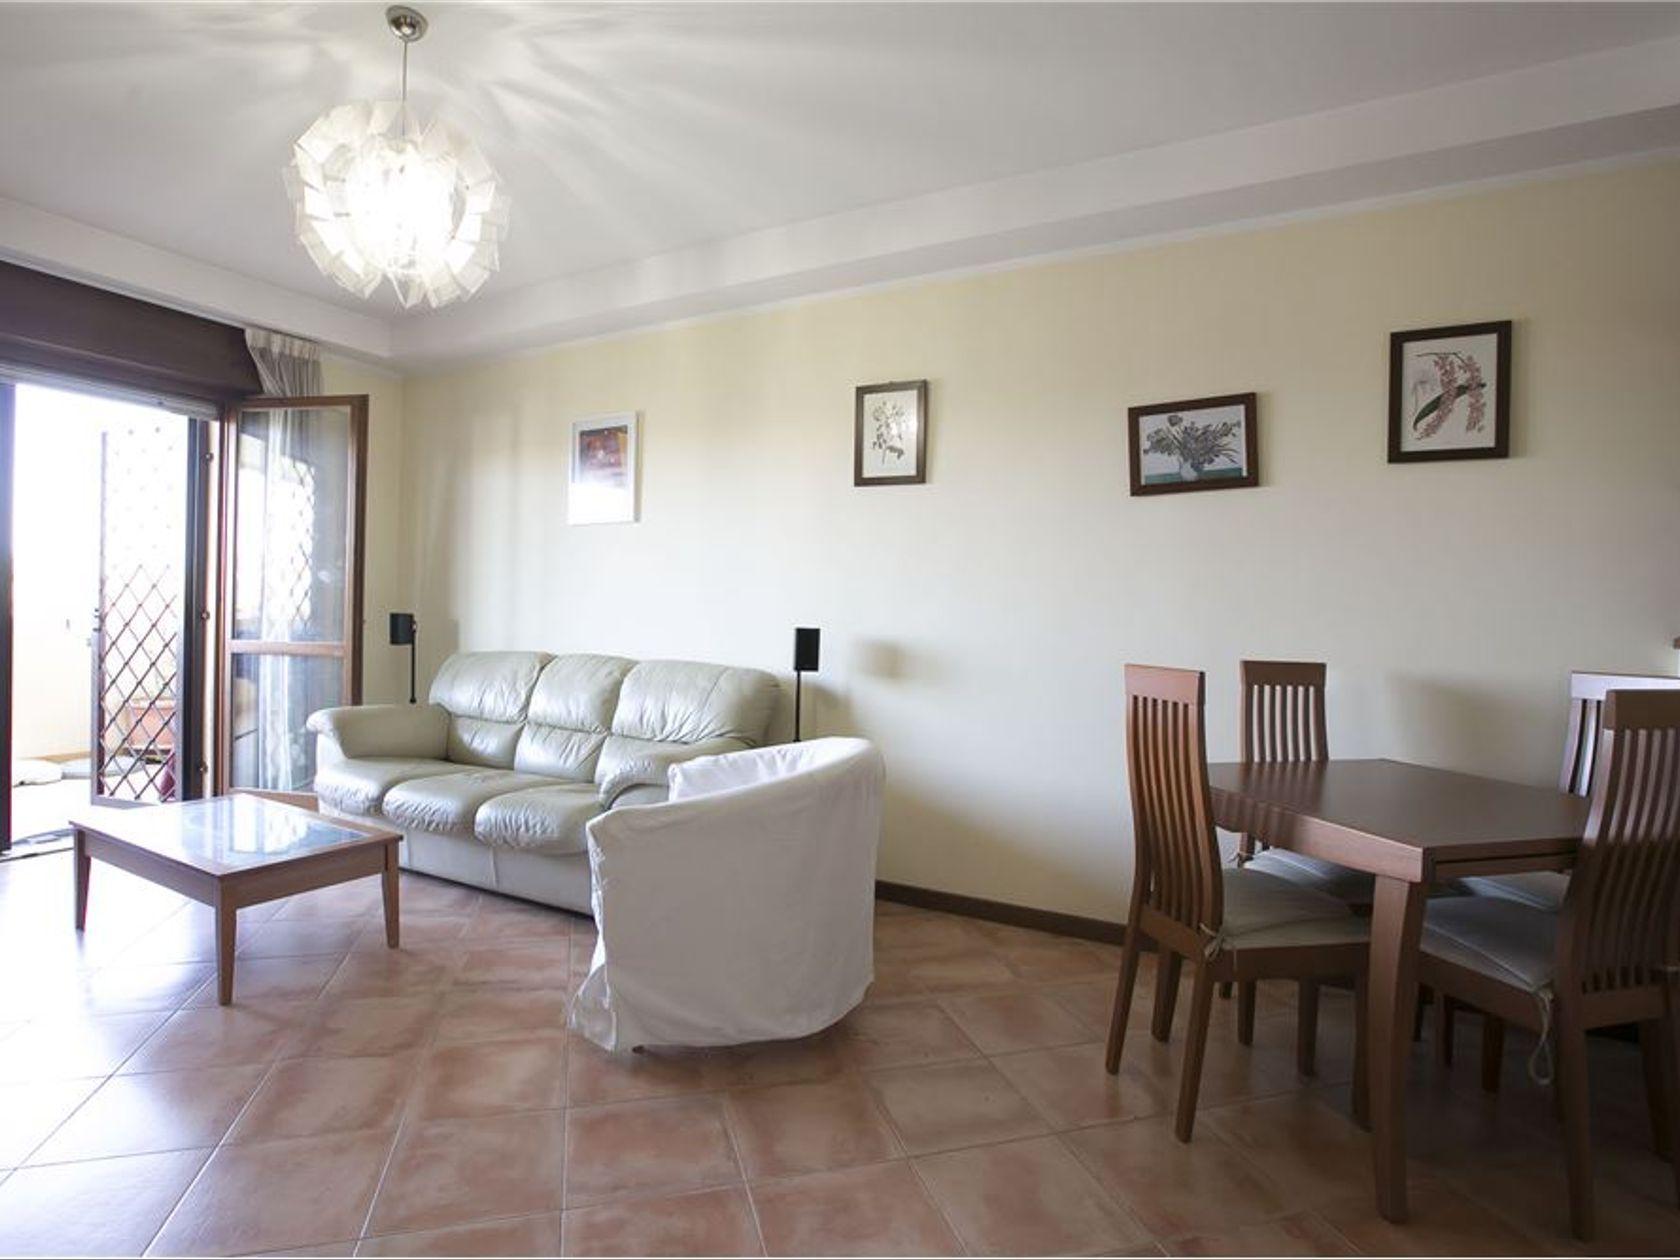 Appartamento Roma-acilia Vitinia Infernetto Axa Casal Palocco, Roma, RM Vendita - Foto 5